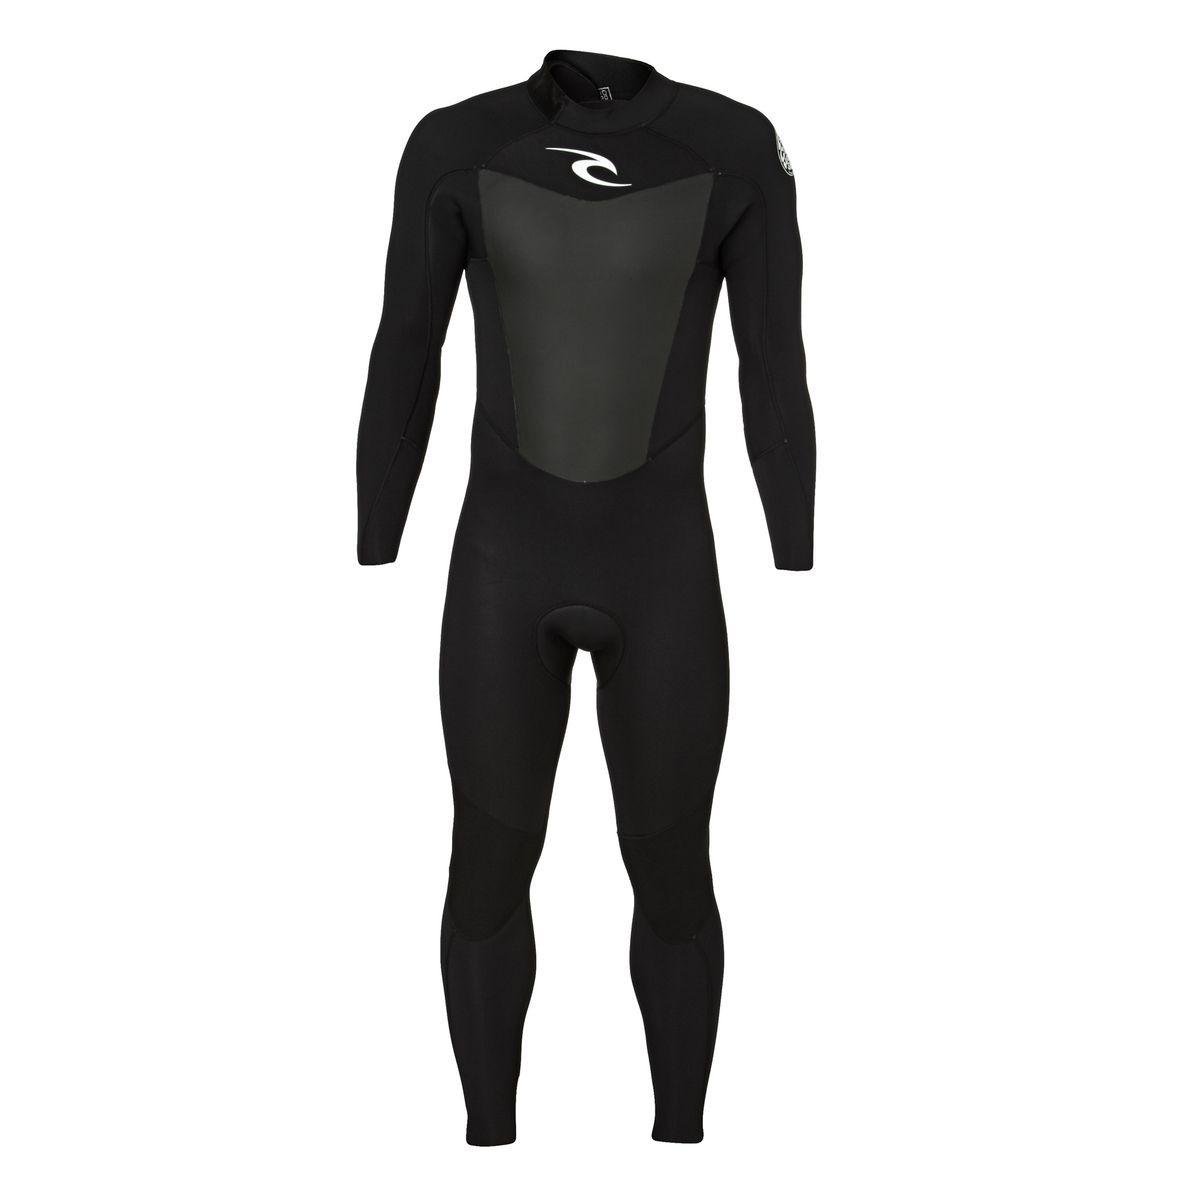 Rip Curl Omega 4/3mm 2017 Back Zip Wetsuit - Black